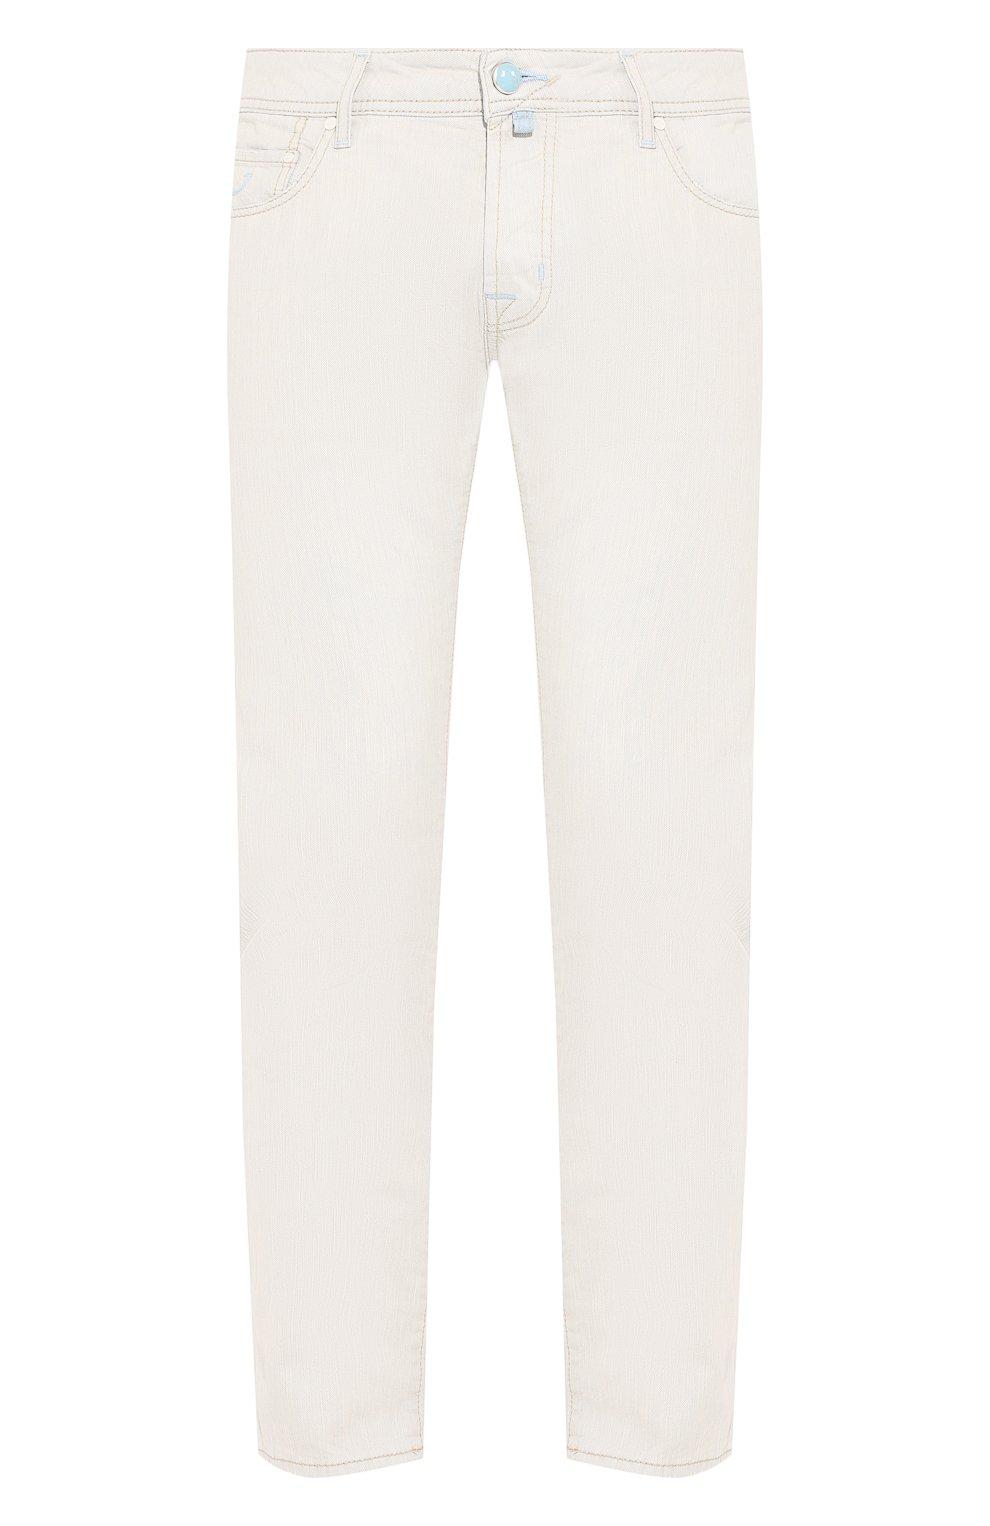 Мужские джинсы JACOB COHEN светло-голубого цвета, арт. J688 C0MF 01539-L/53 | Фото 1